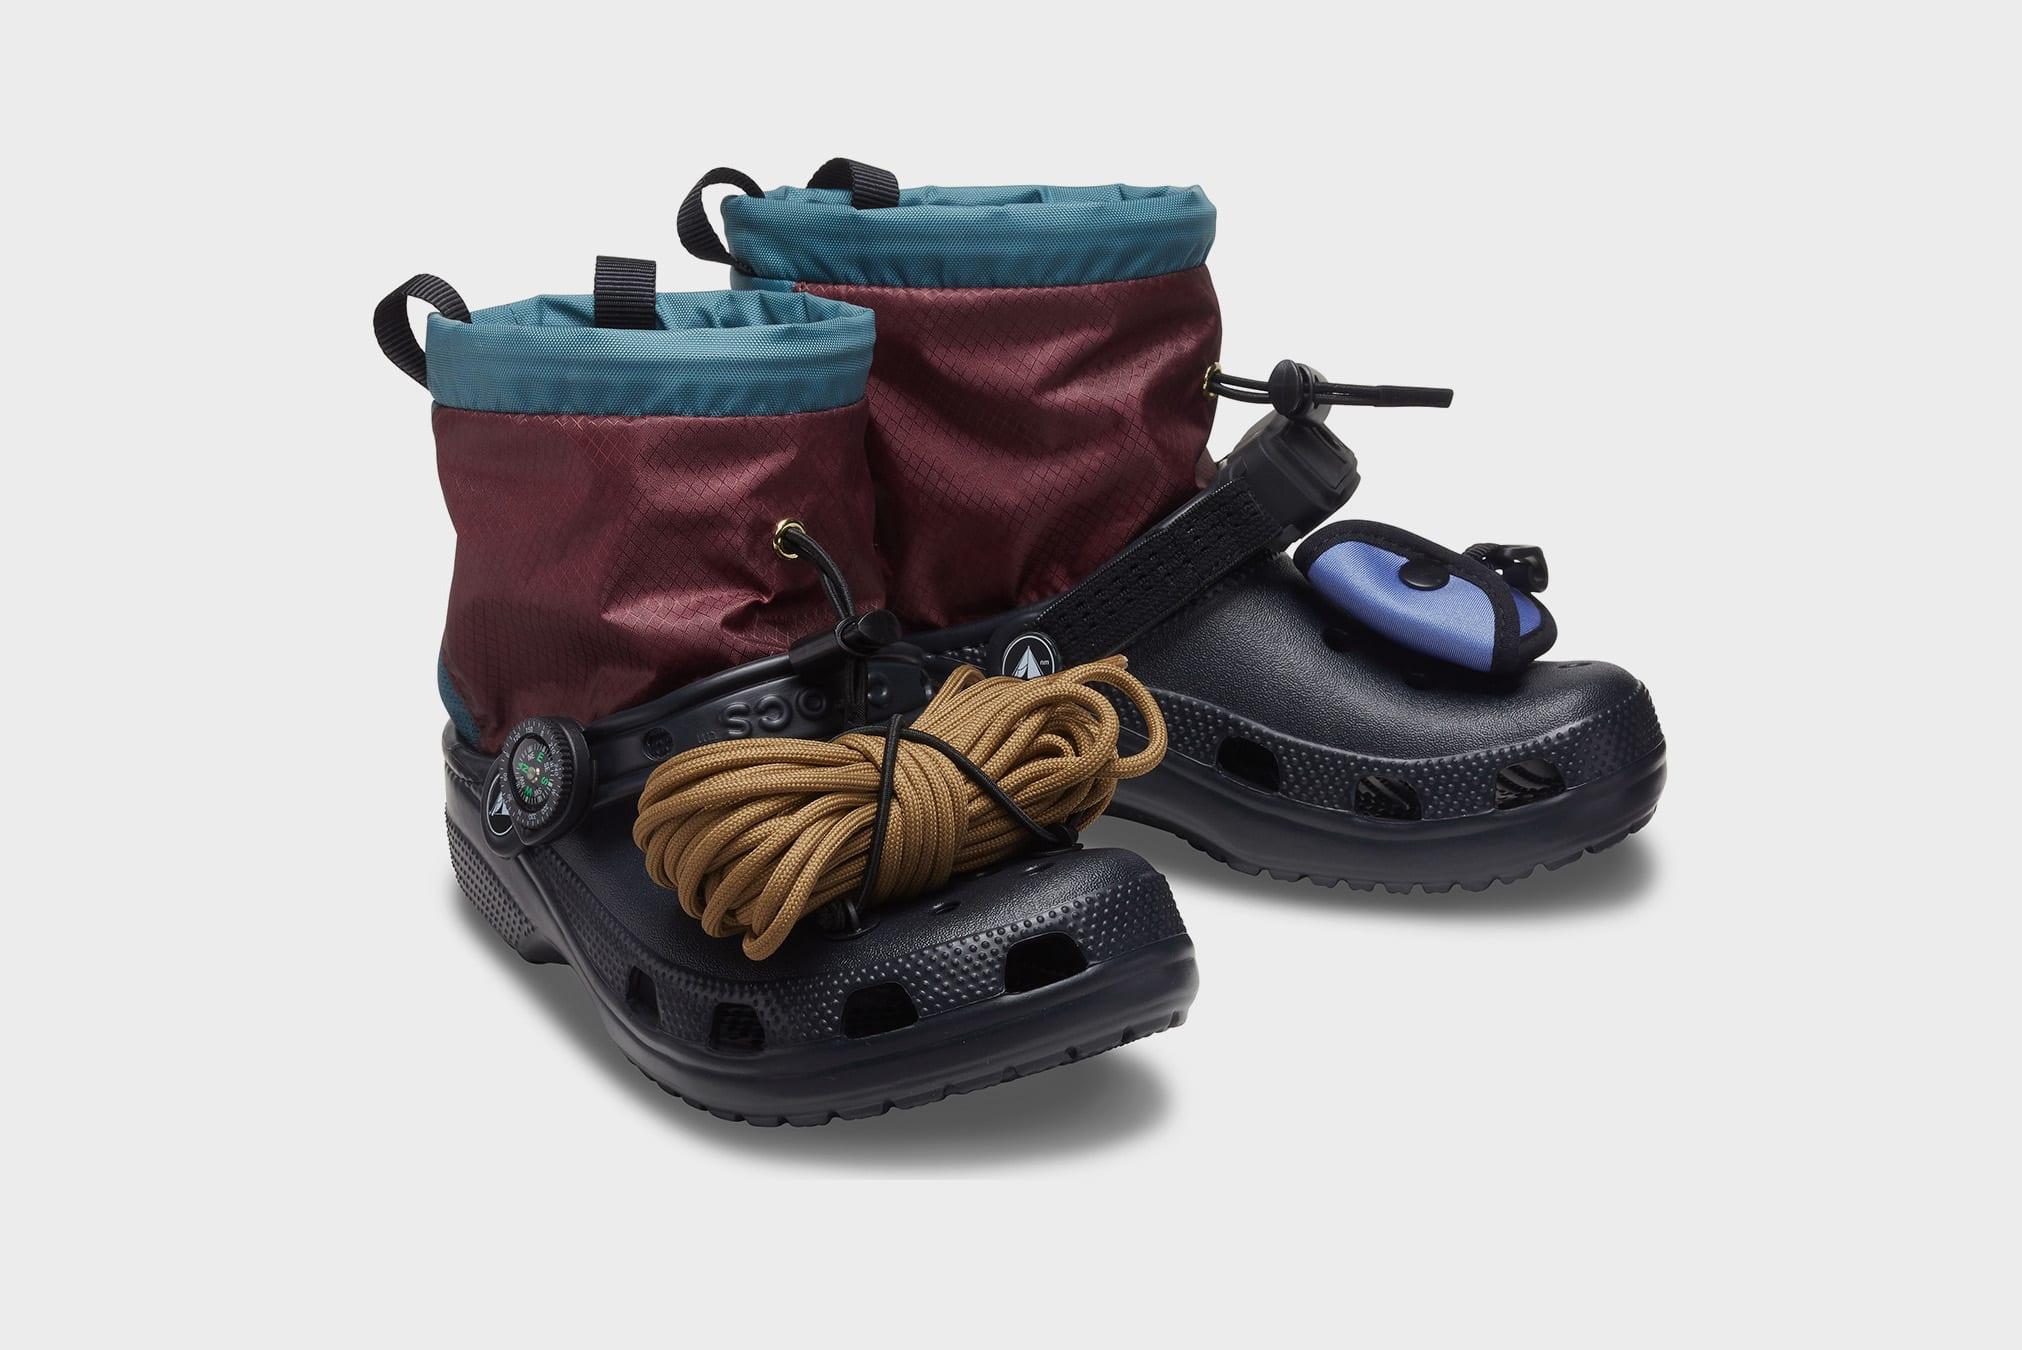 Crocs x Nicole Mclaughlin Campsite Classic Clog - 206905-BLK